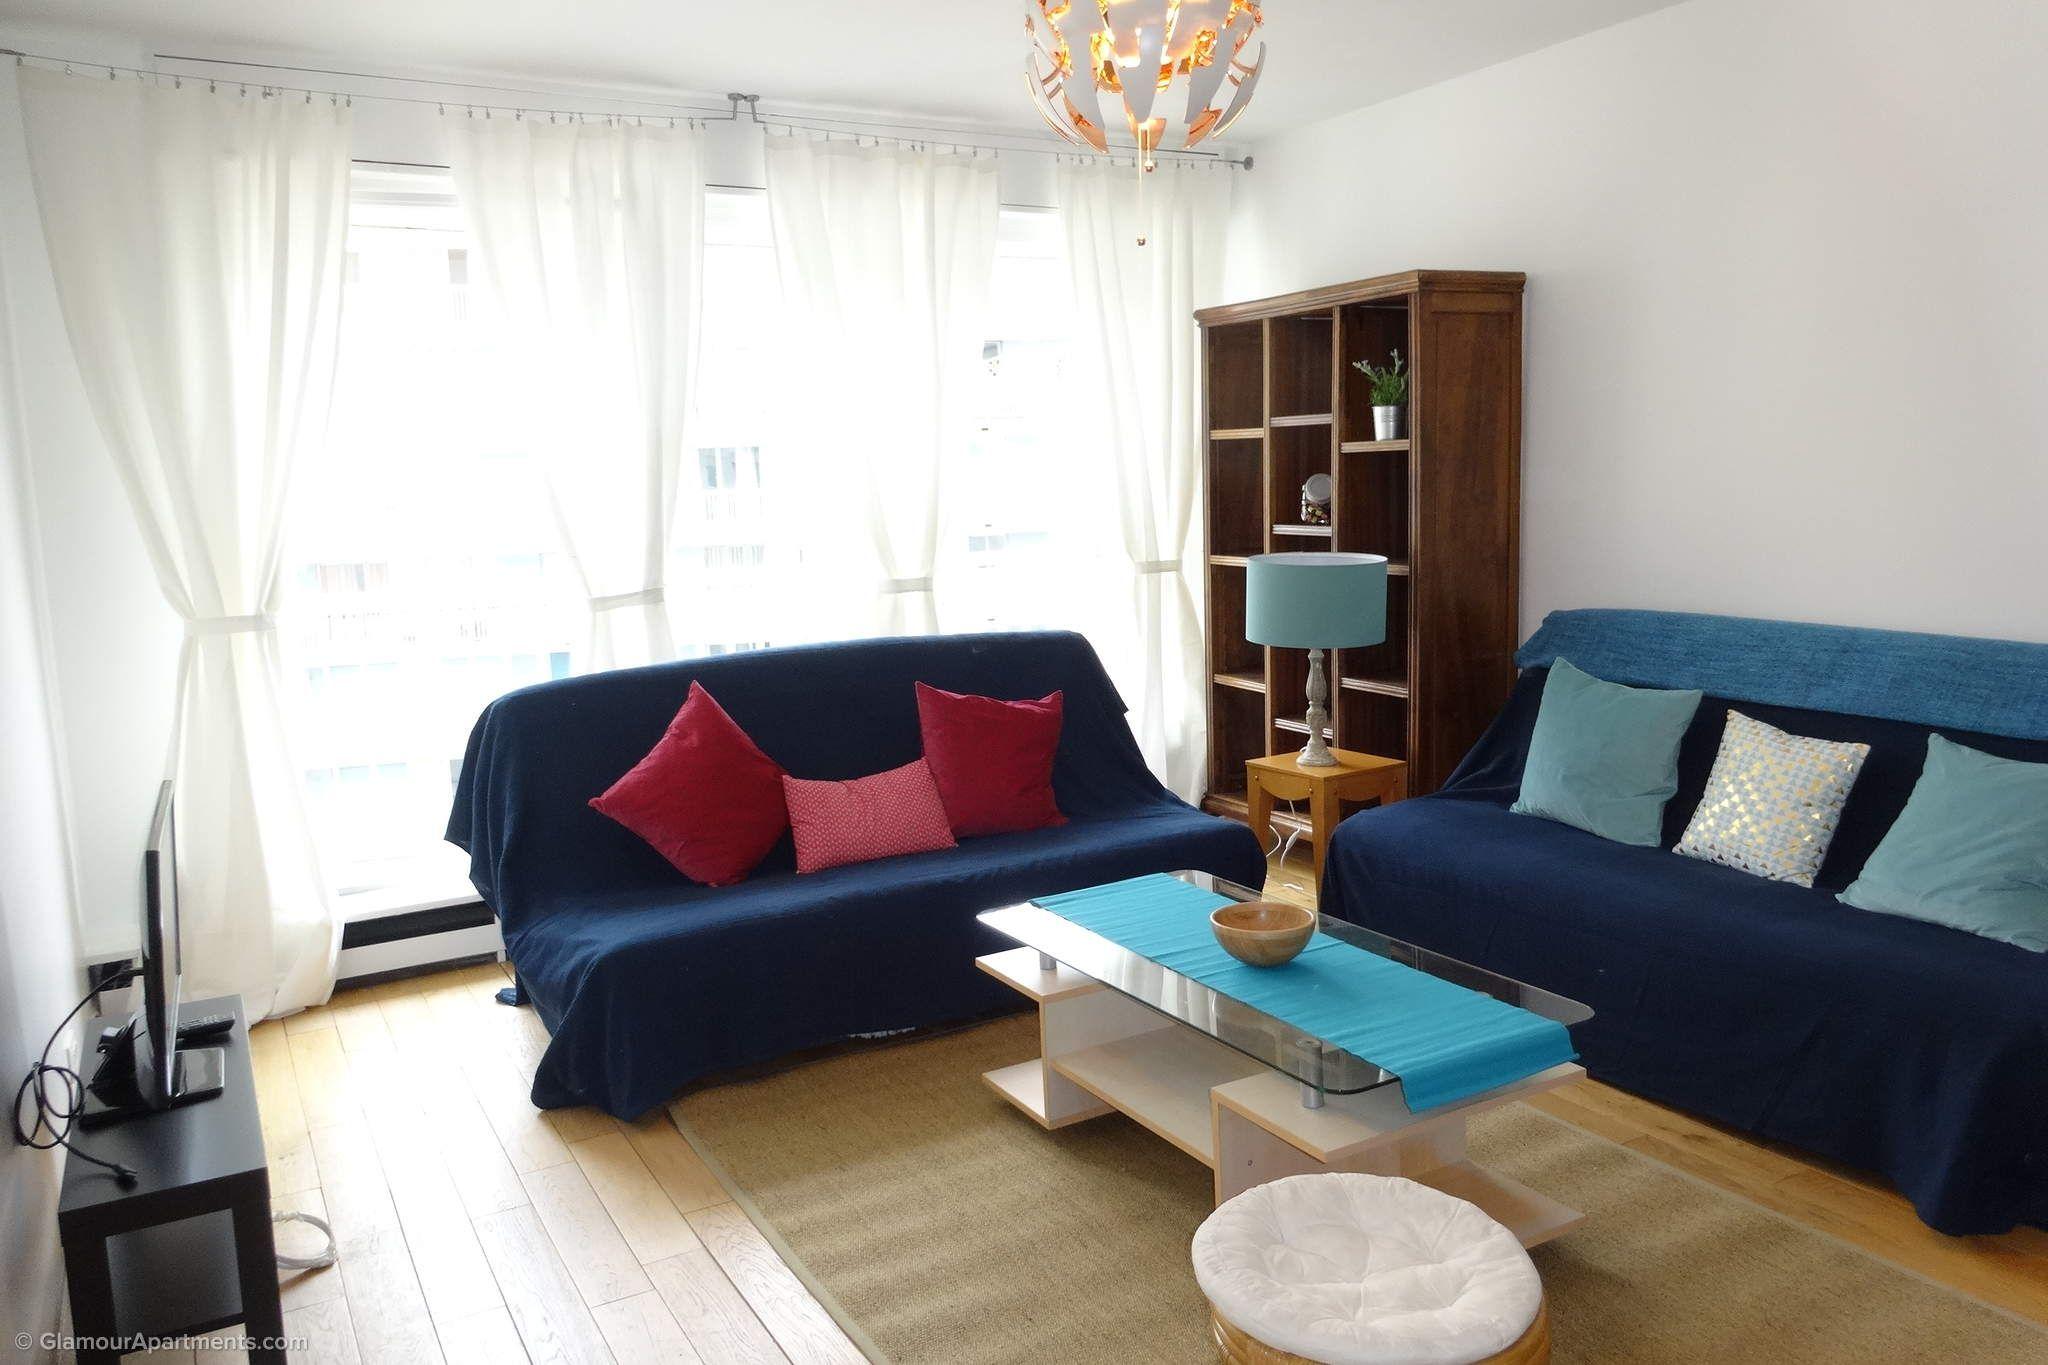 1 Bedroom Furnished Apartment For Rent At Rue De La Fédération In The 15th Arrondist